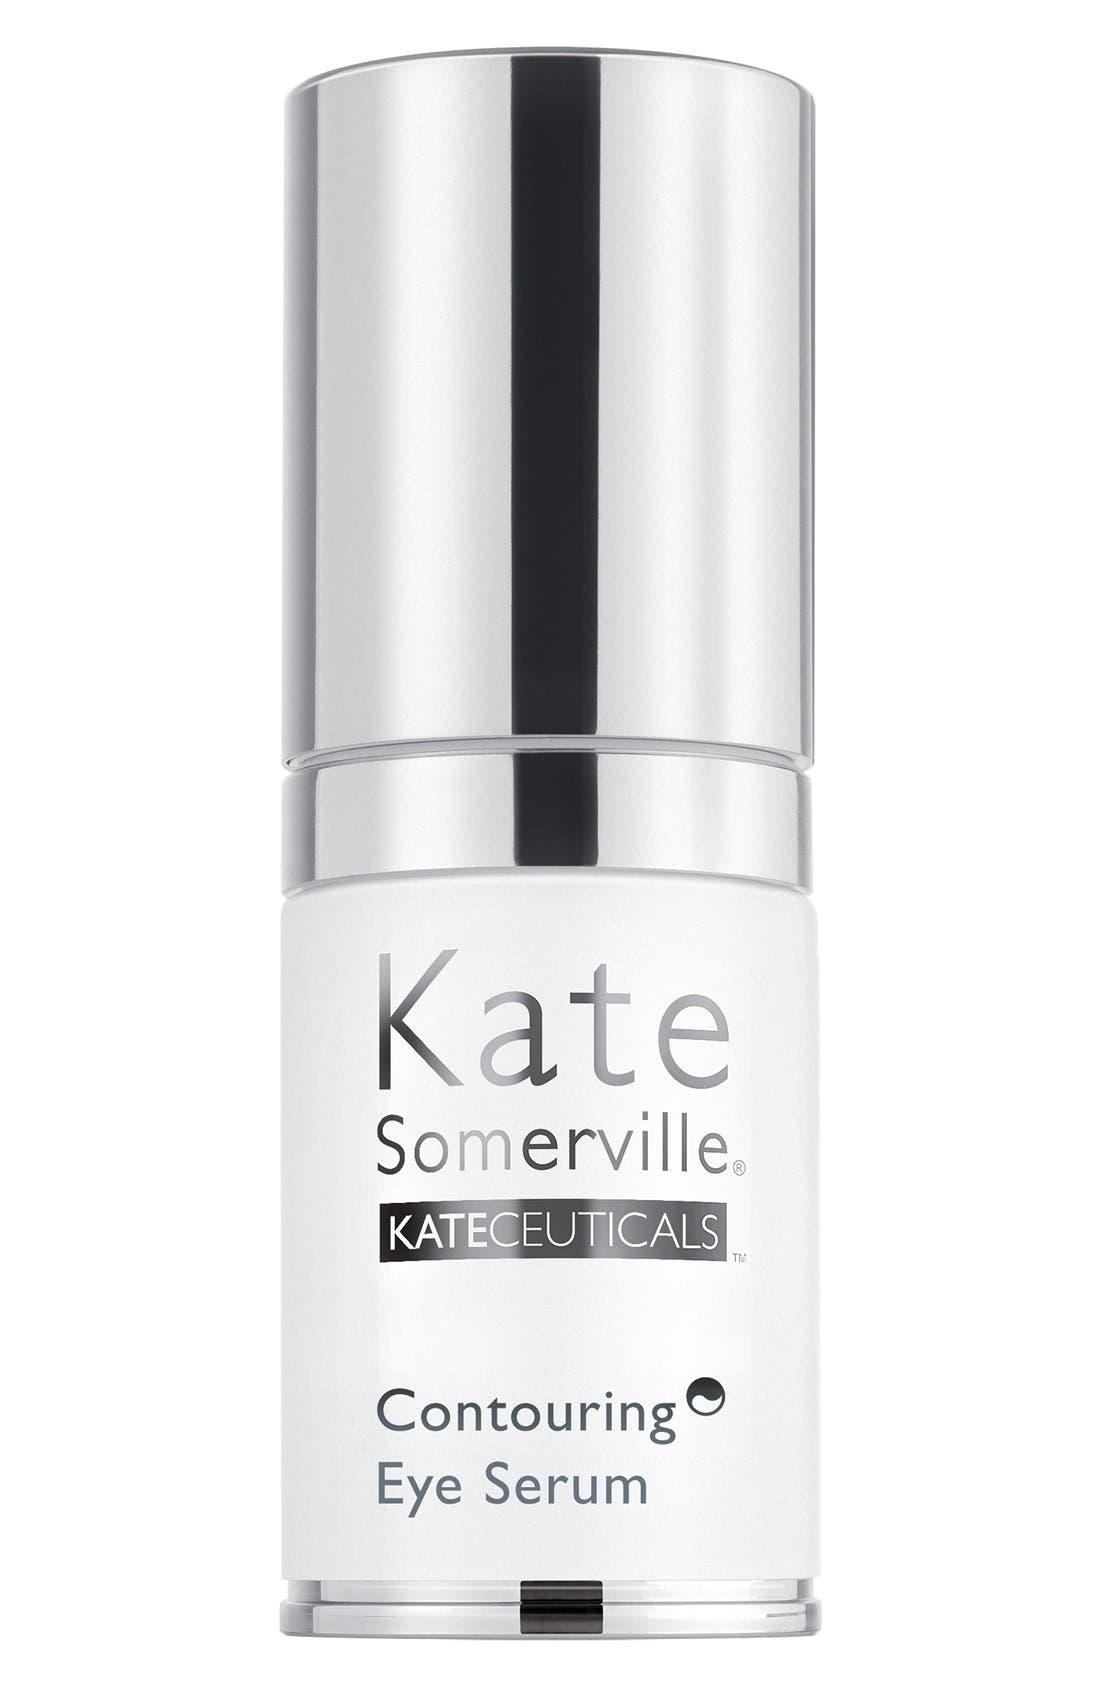 'KateCeuticals<sup>™</sup>' Contouring Eye Serum,                             Main thumbnail 1, color,                             NONE